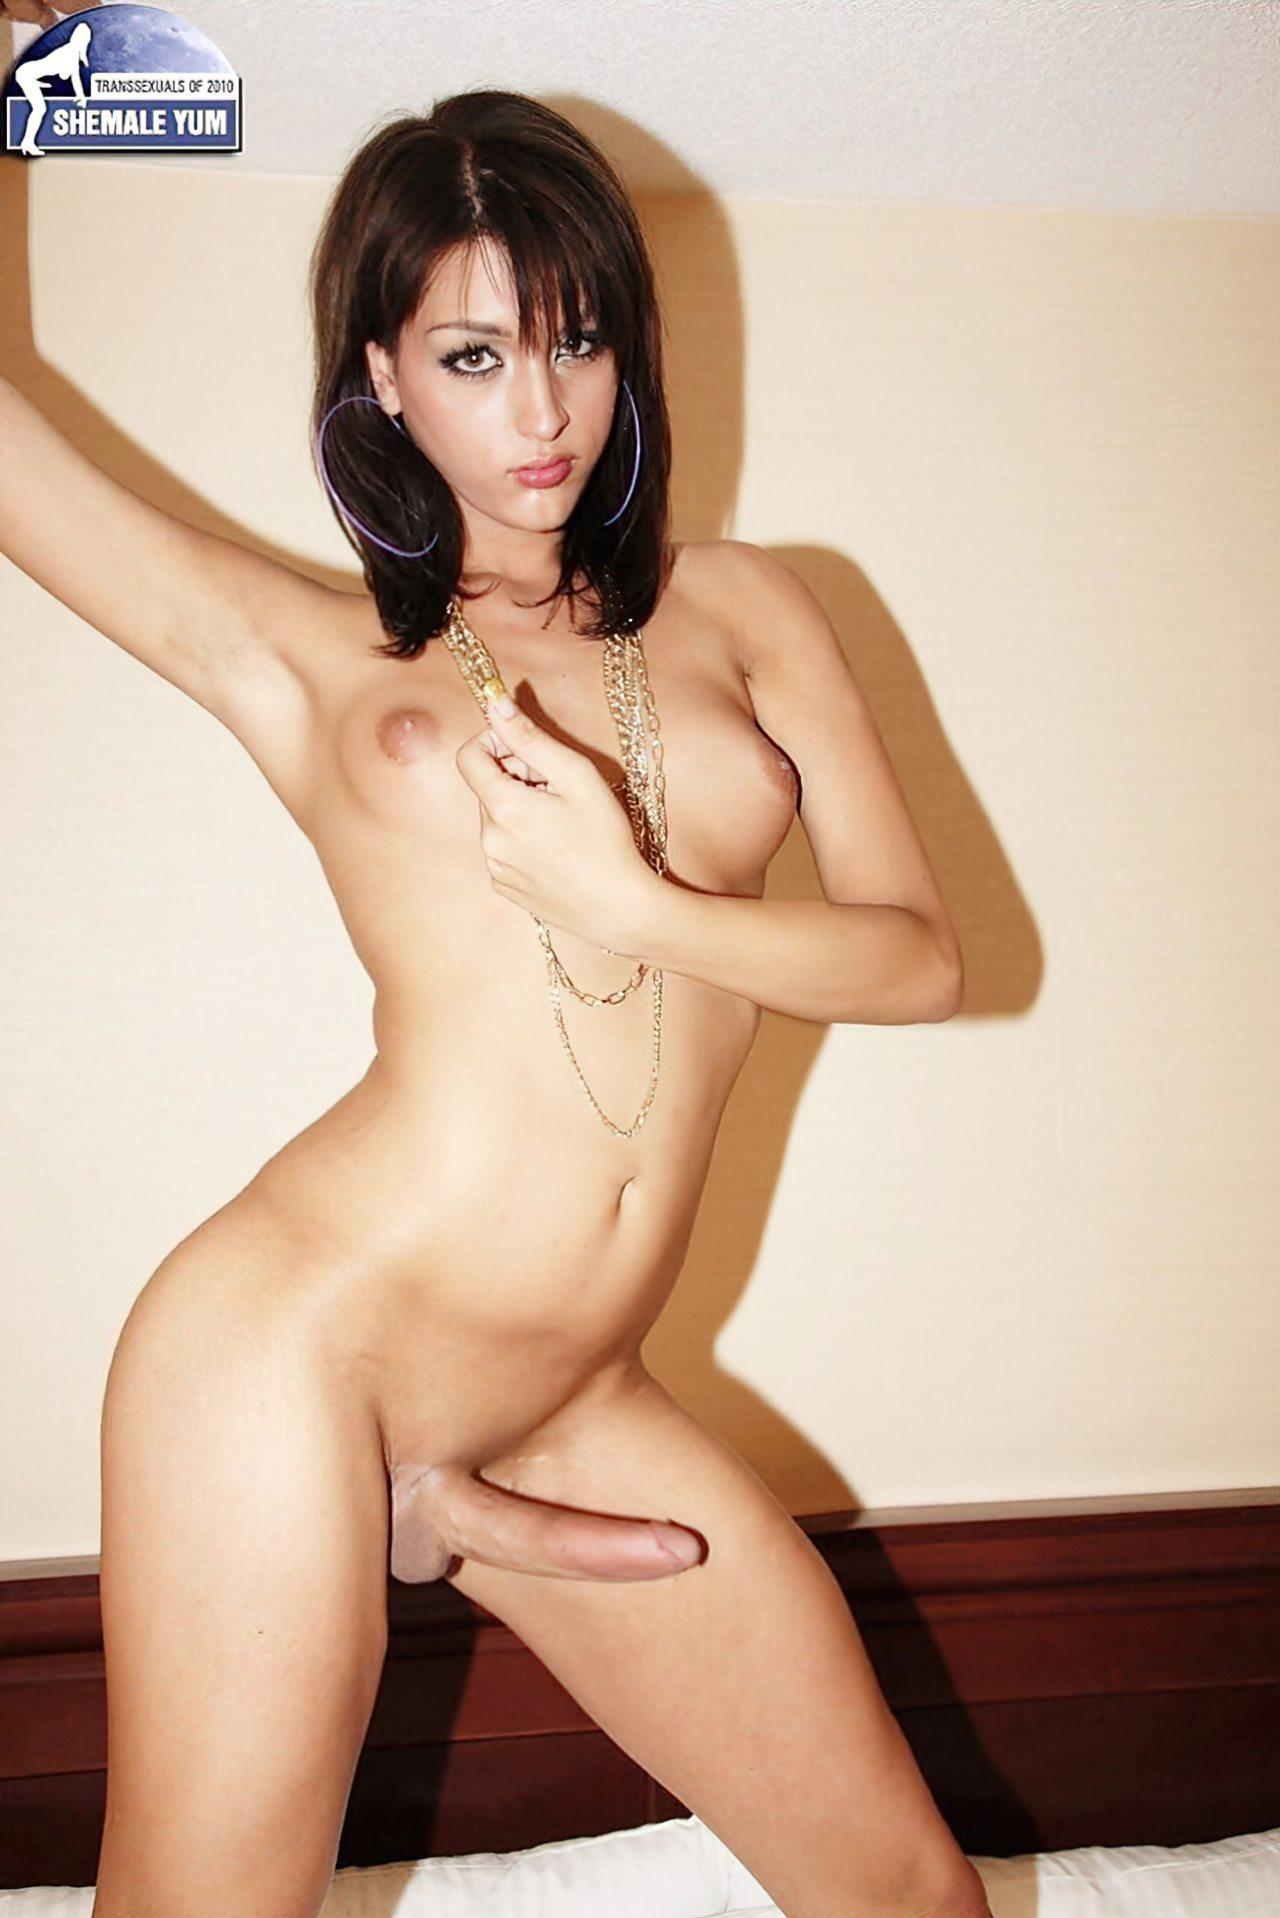 Travestis Fotos Nuas (37)